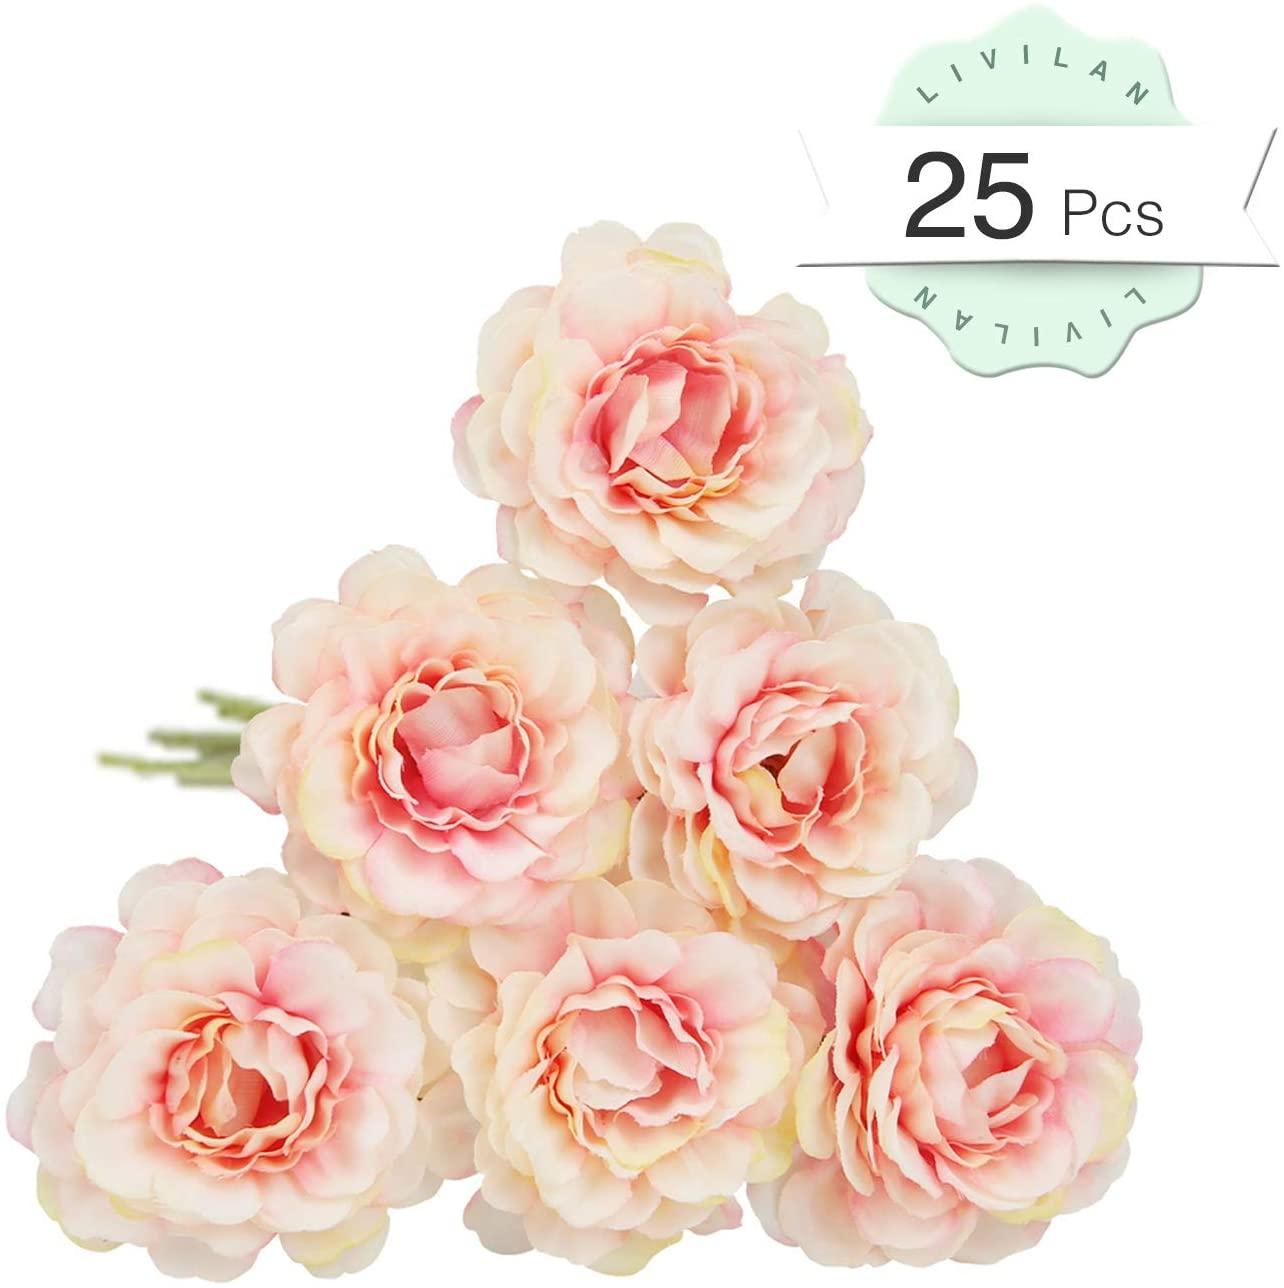 LIVILAN 25pcs Artificial Azalea Flowers, Silk Fake Flowers, Bridesmaid Bridal Bouquets, Home Decoration DIY Wedding Party Vivid Lifelike Pink